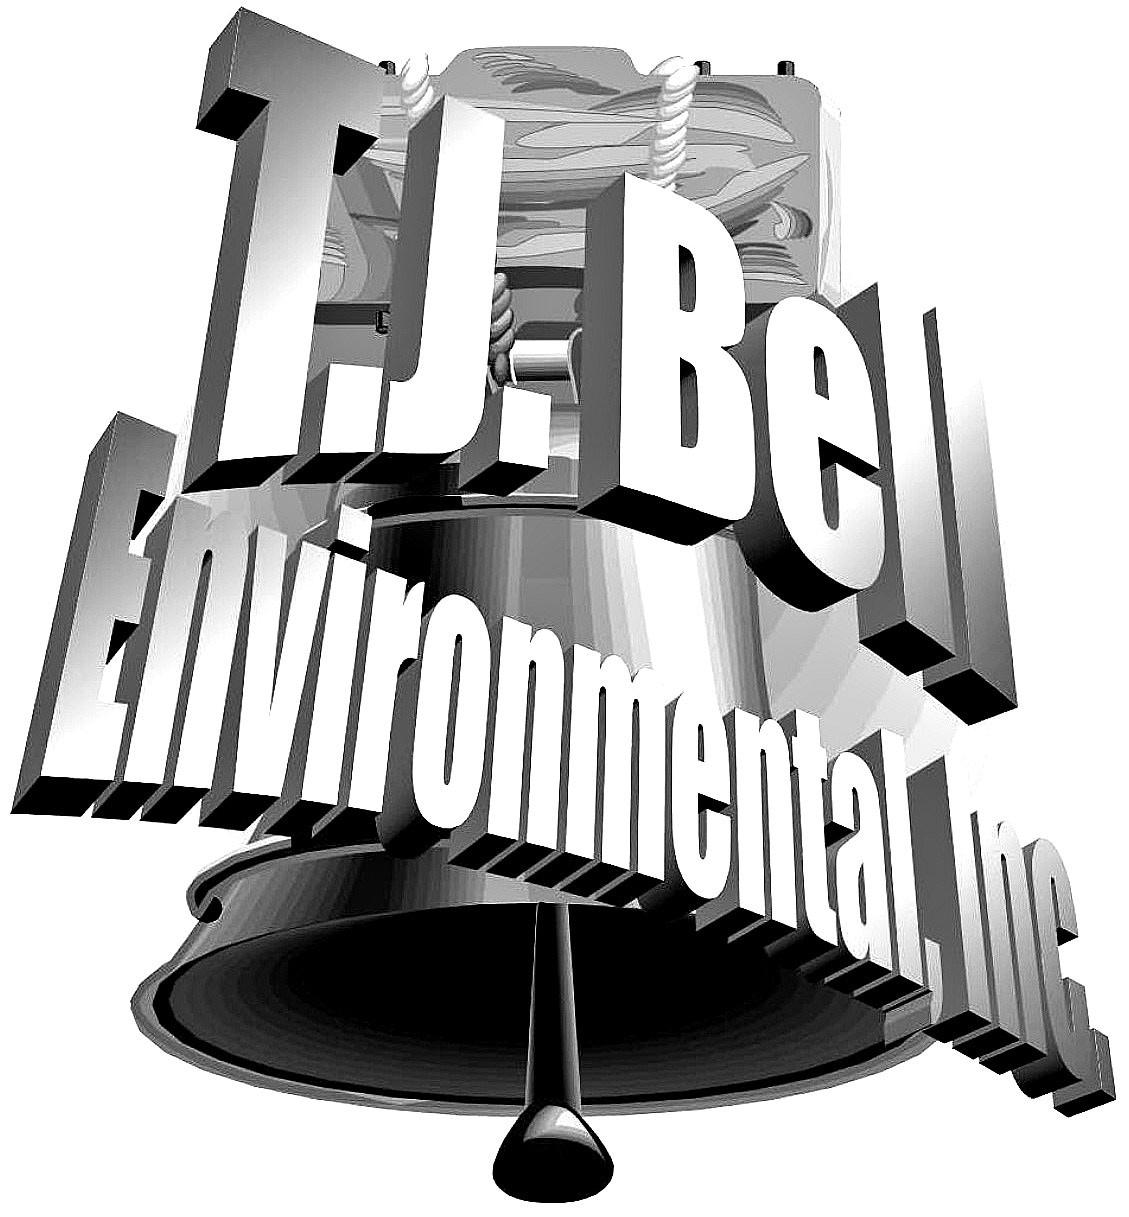 T.J. Bell Environmental Inc.